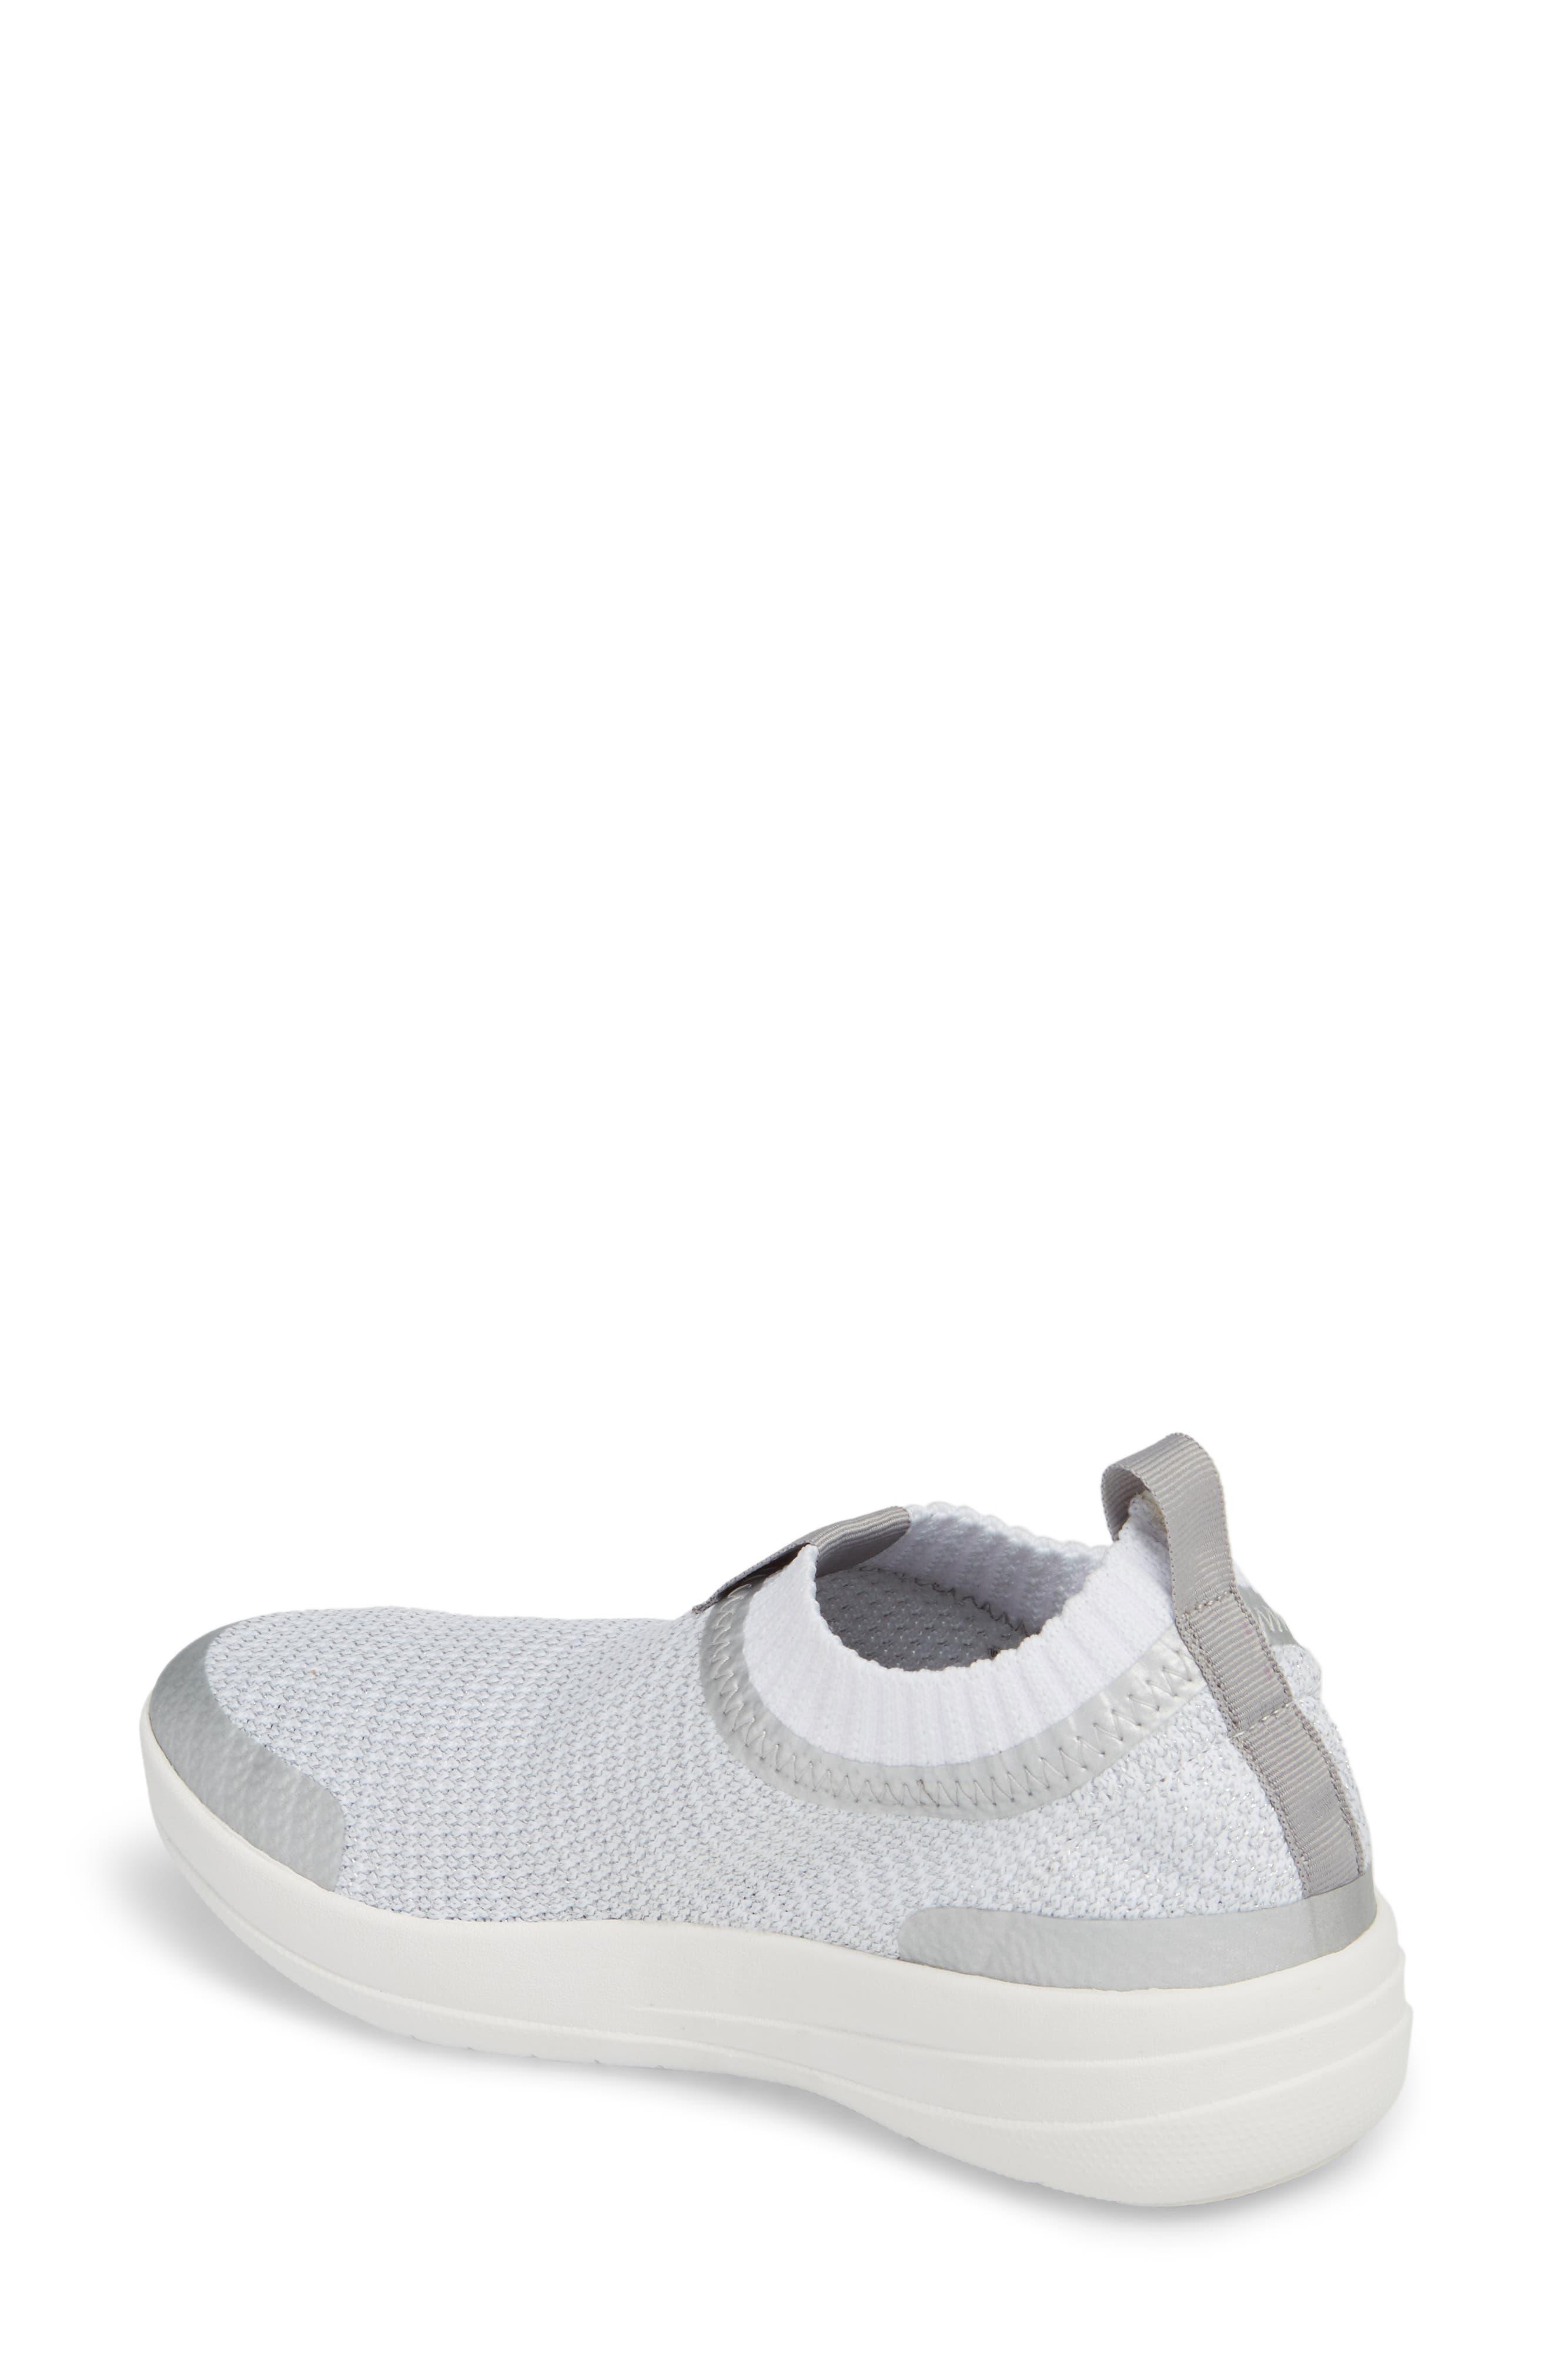 Uberknit Knit Sock Sneaker,                             Alternate thumbnail 2, color,                             040